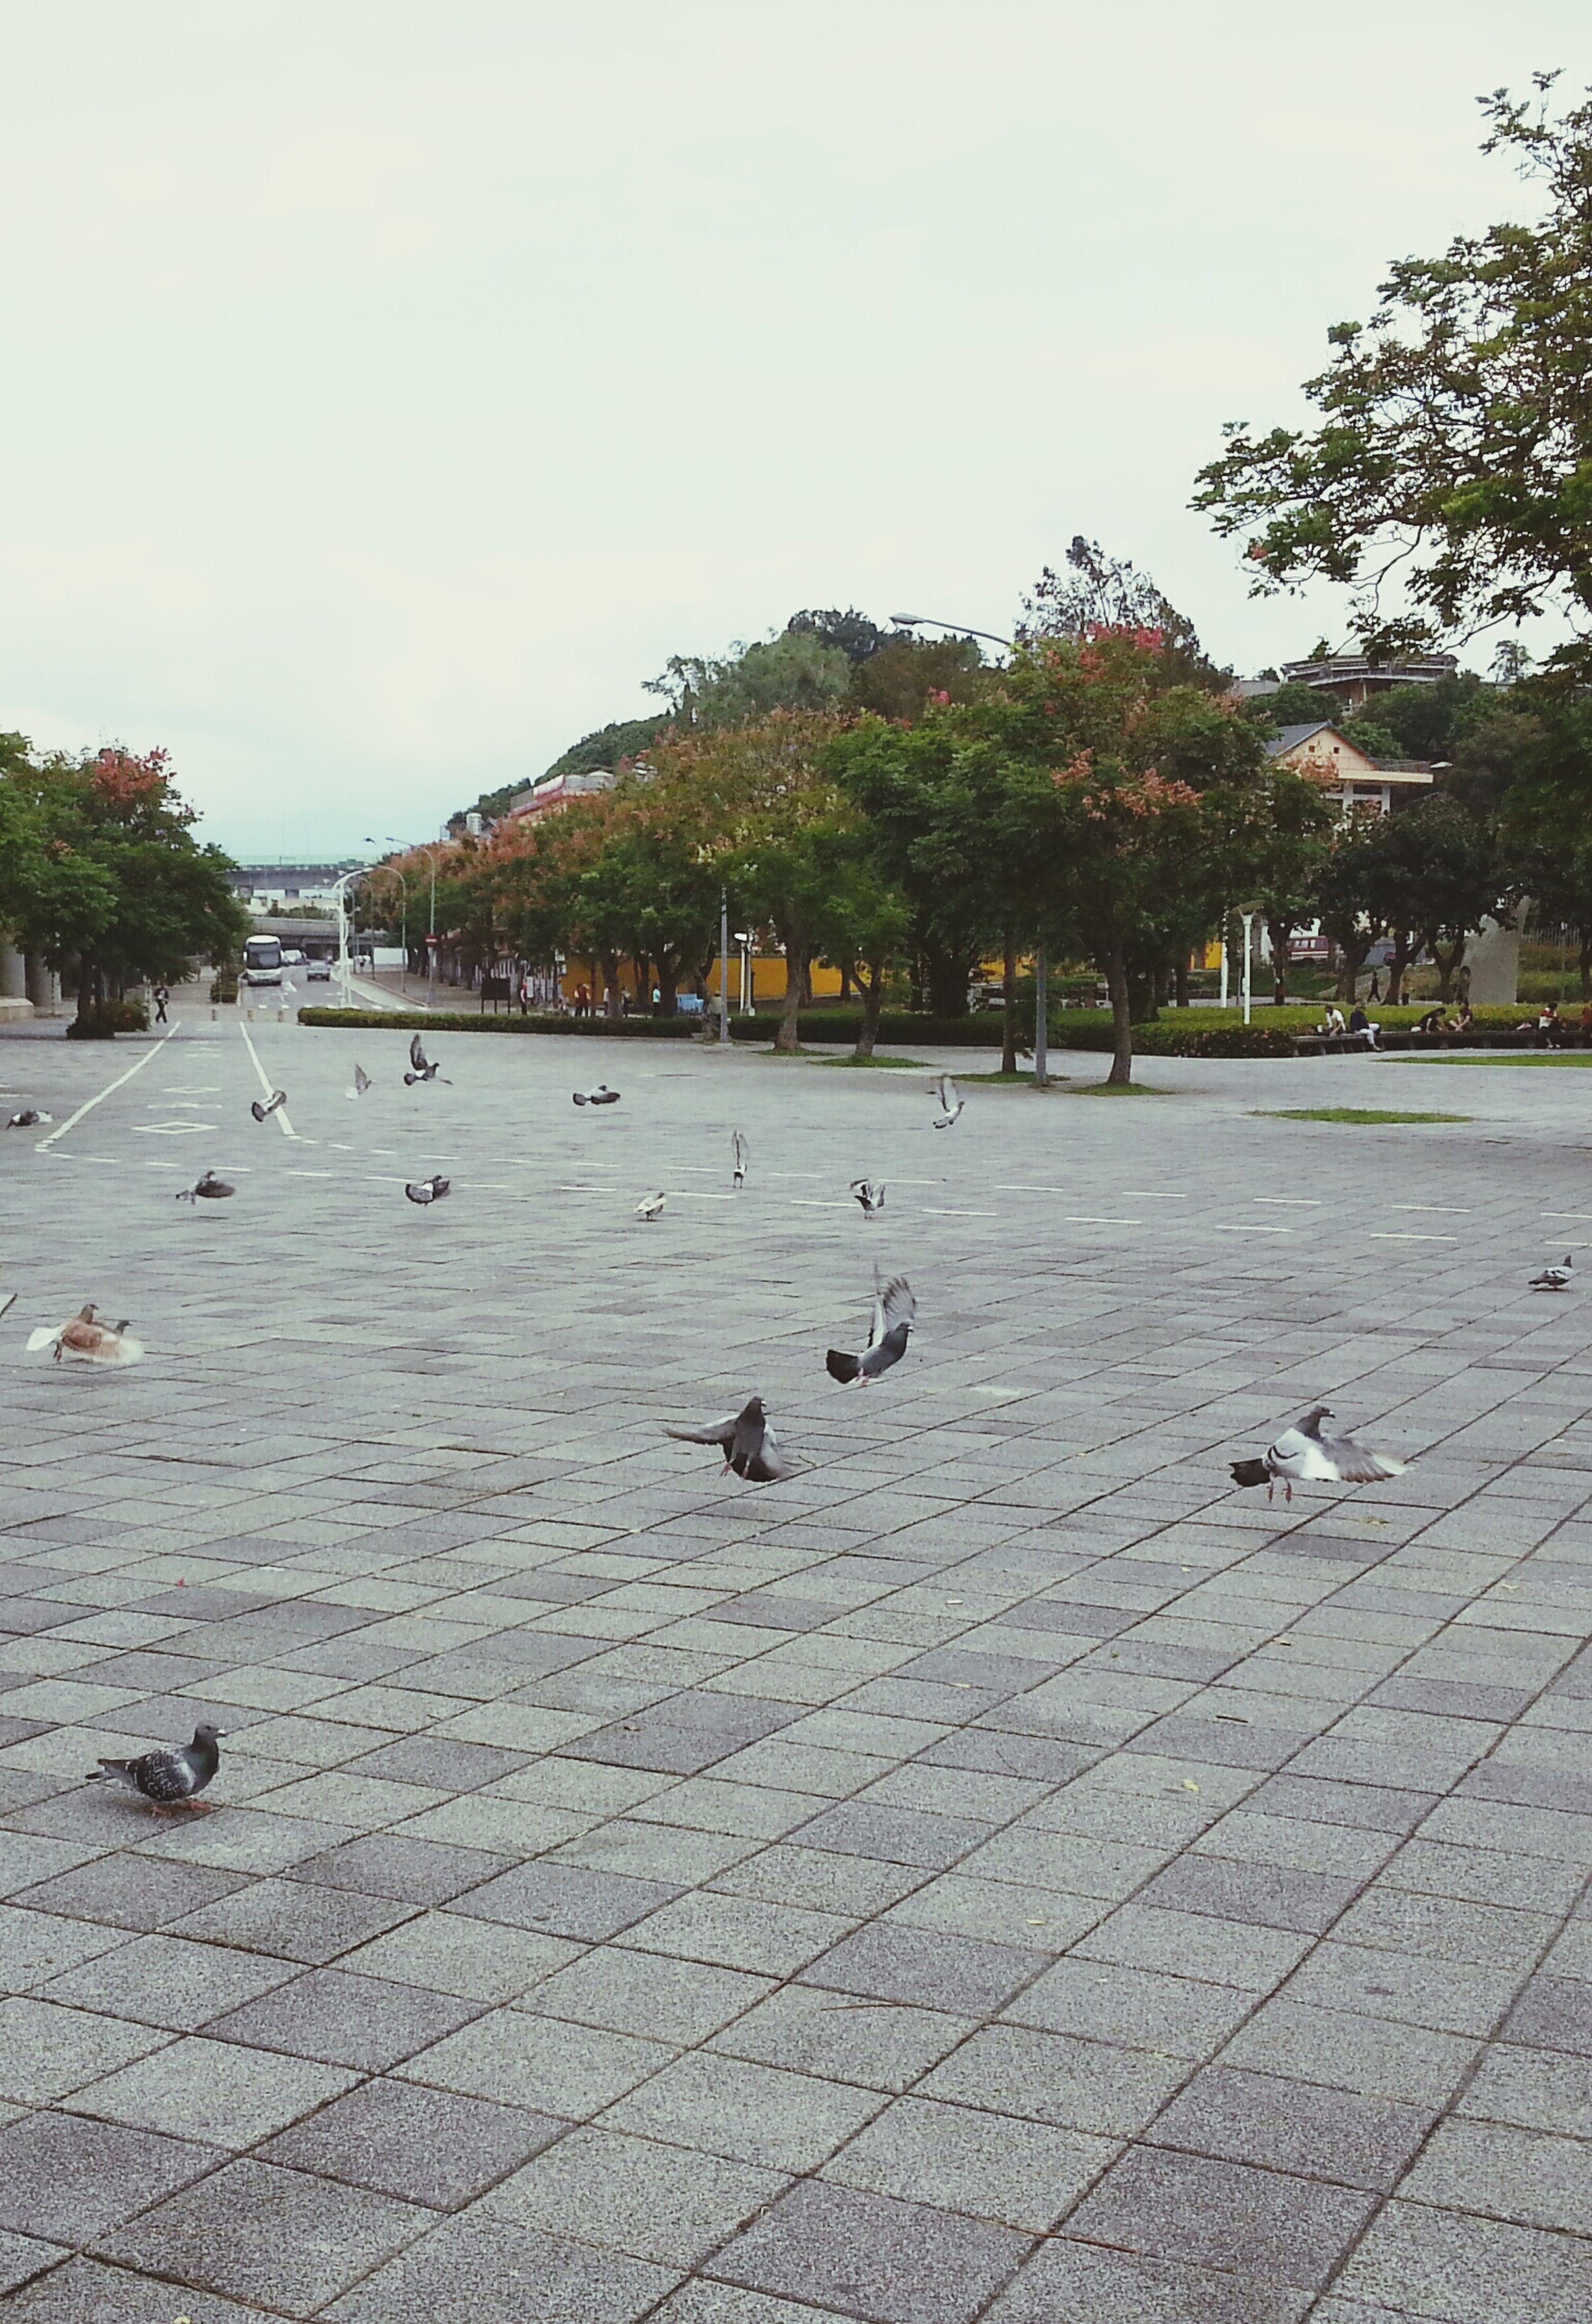 Pigeons Doves GoToWork At The Park Commuting 鴿子 圓山 Mrt 花博 起飛